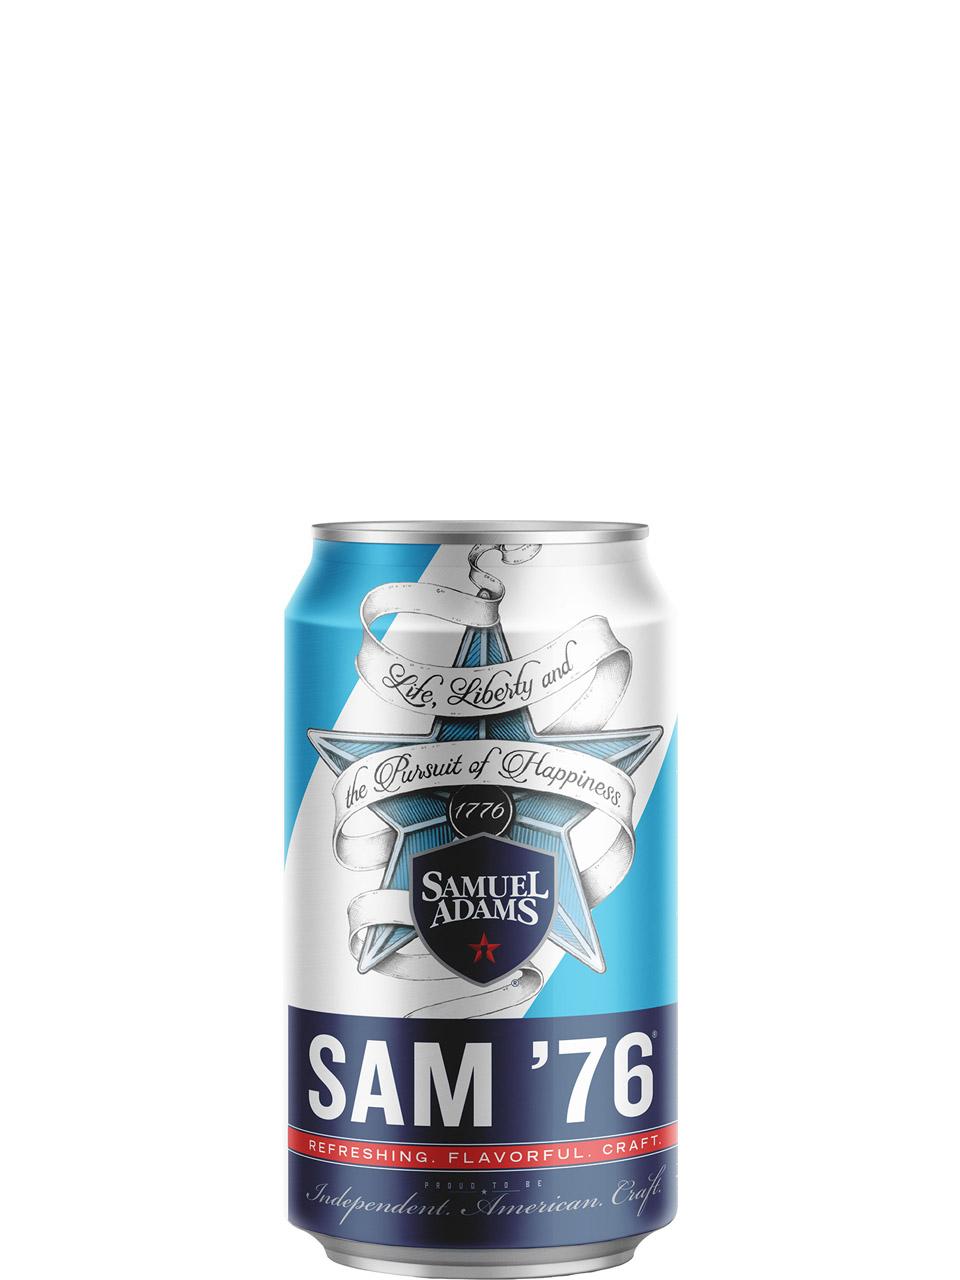 Samuel Adams '76 6 Pack Cans